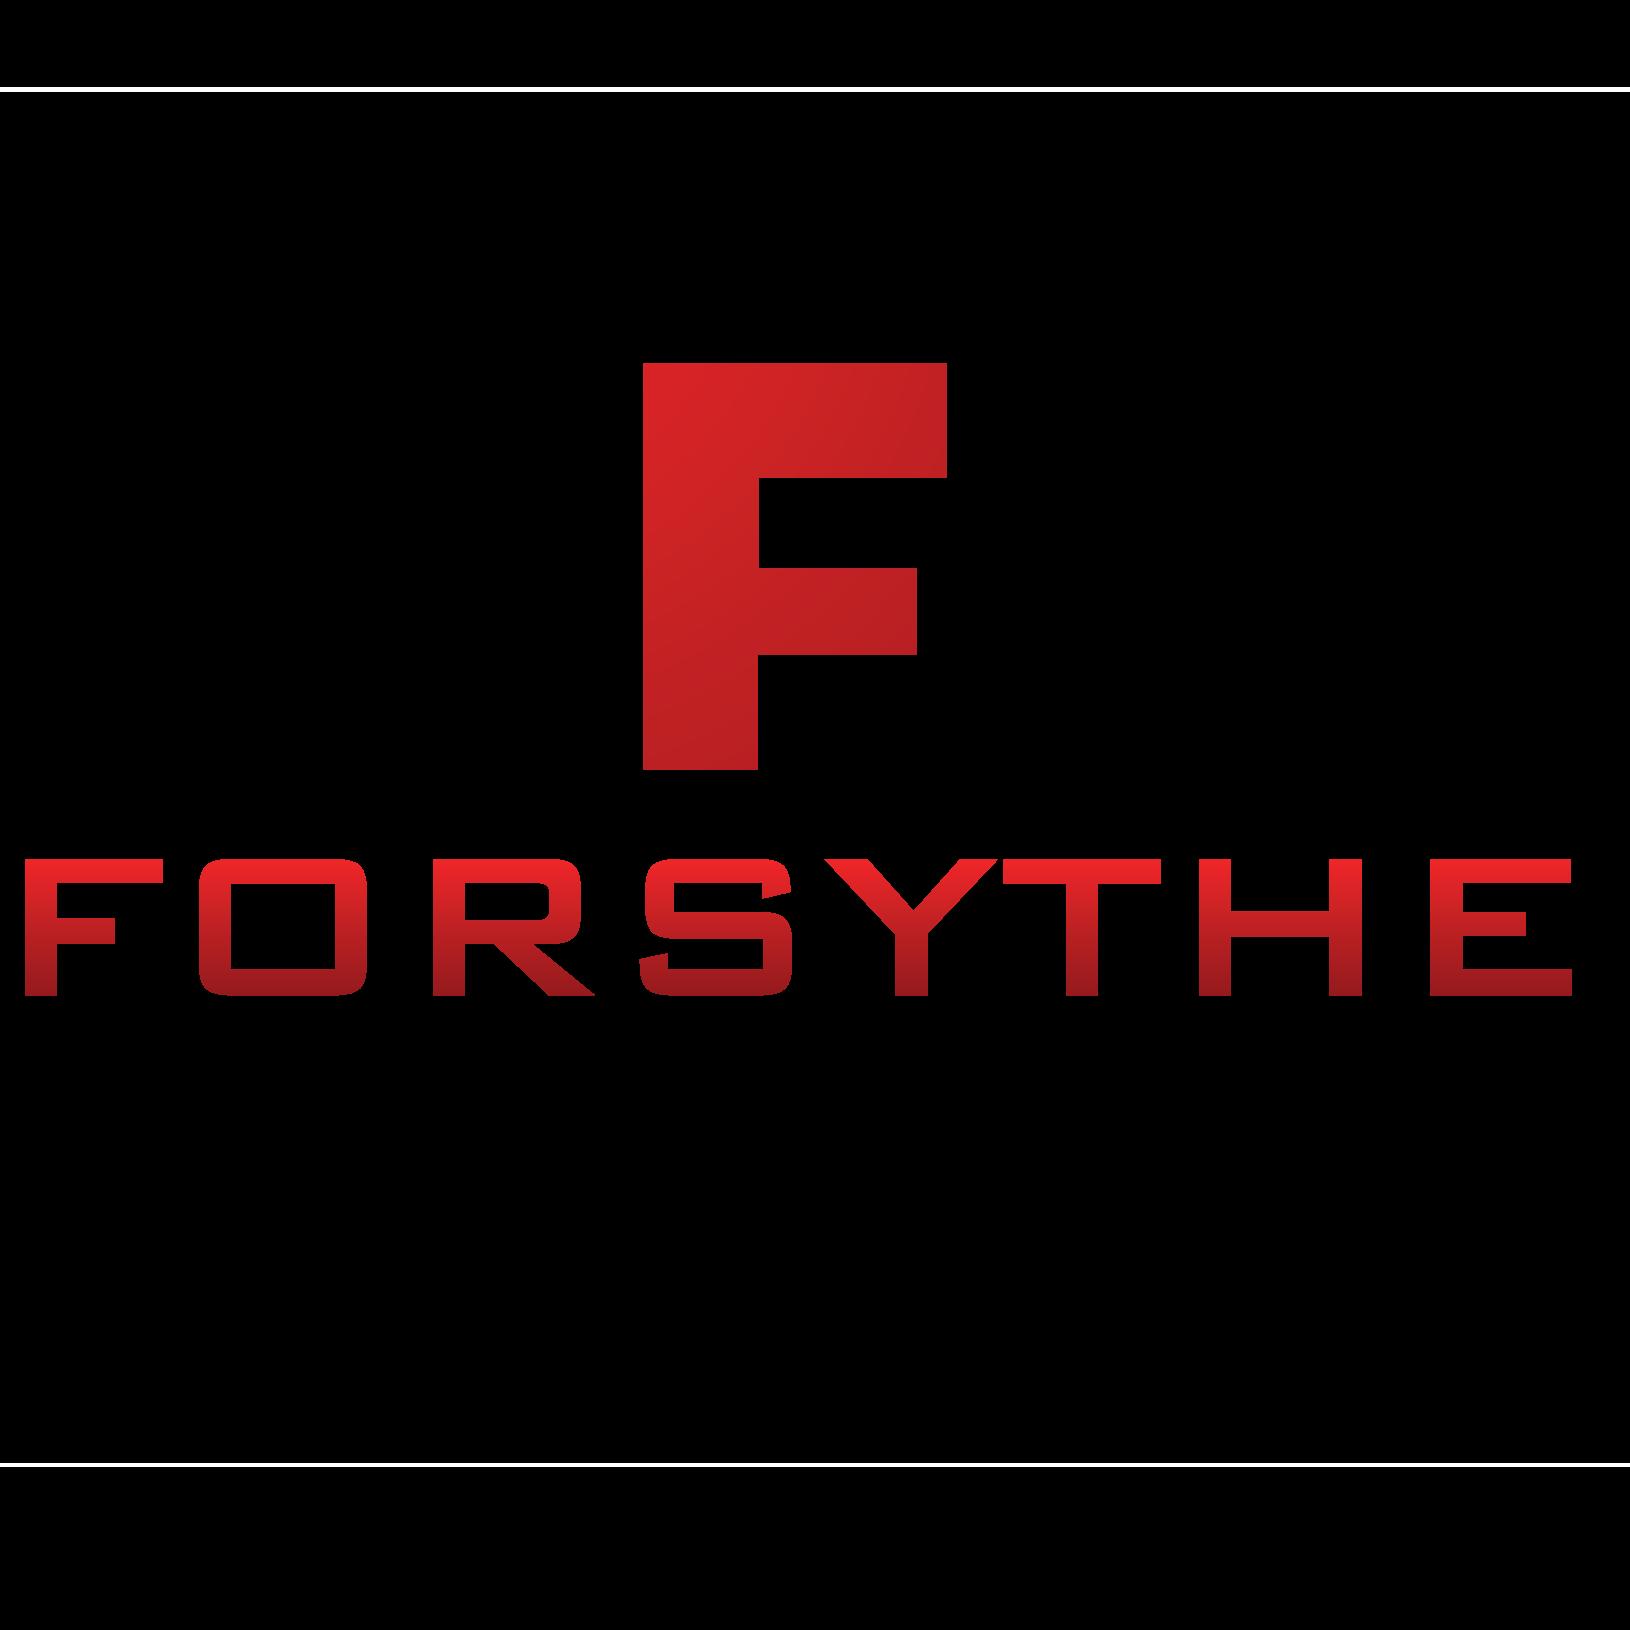 Forsythe Fence Co LLP